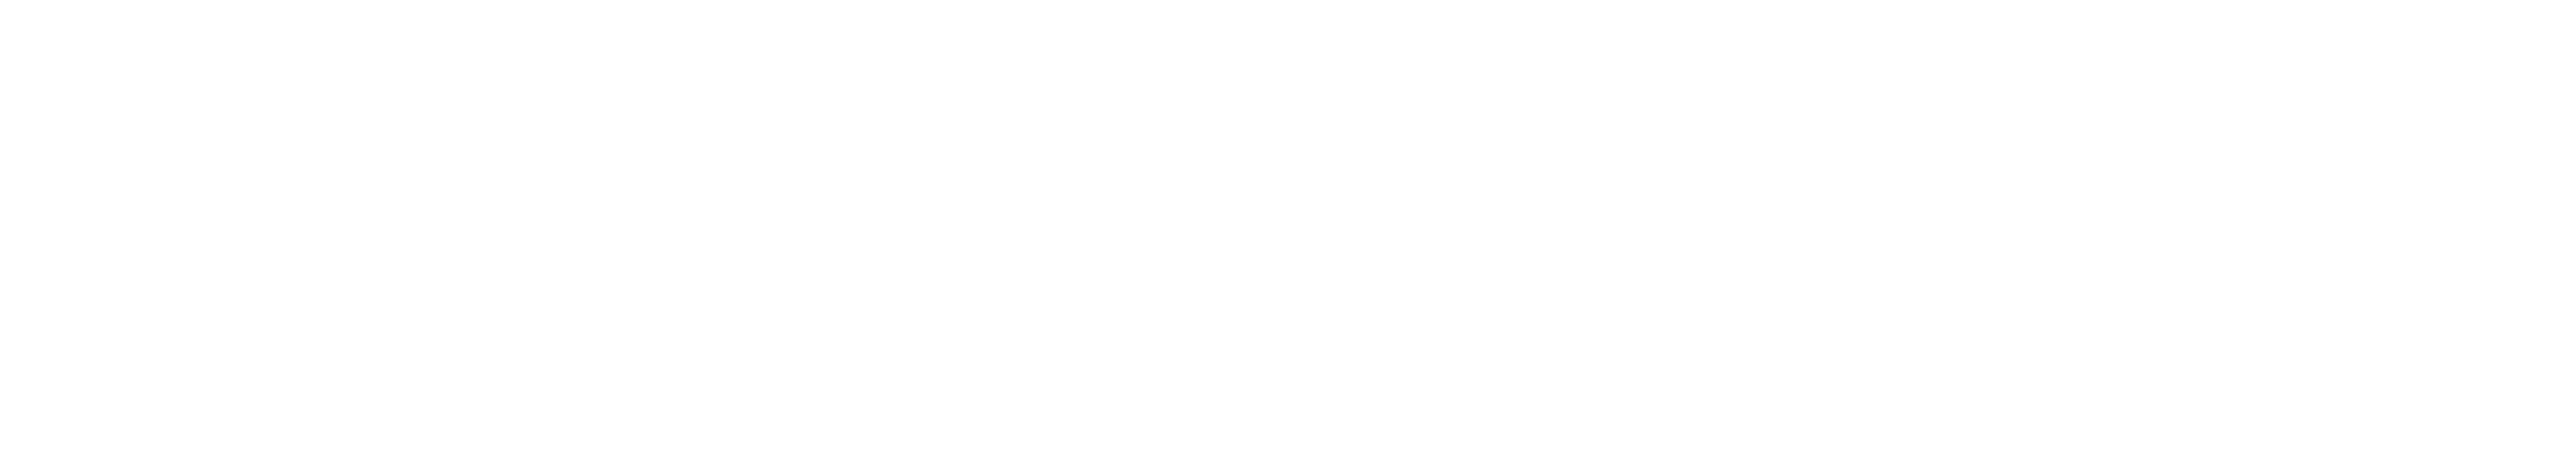 Goharzi | Digital Media Designs